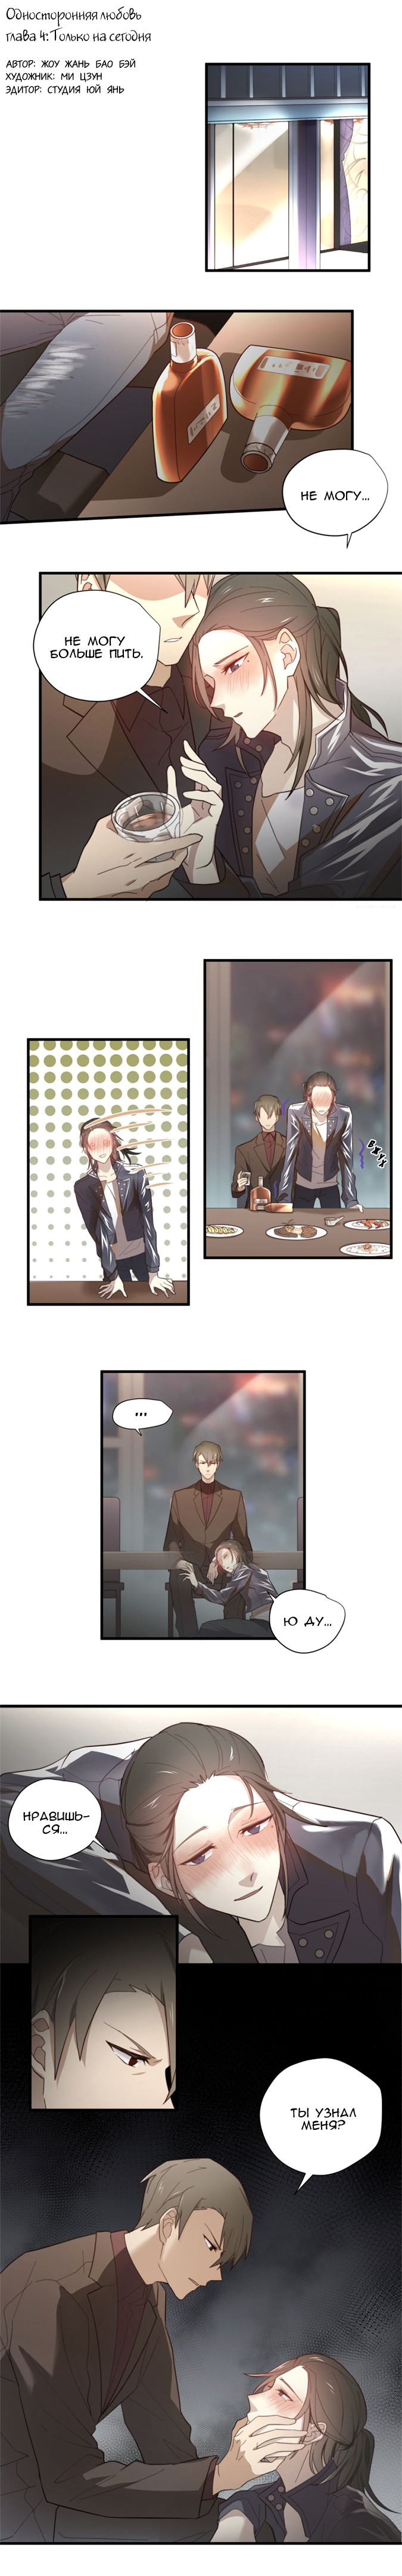 https://r1.ninemanga.com/comics/pic2/18/34514/474045/1538075767123.jpg Page 2